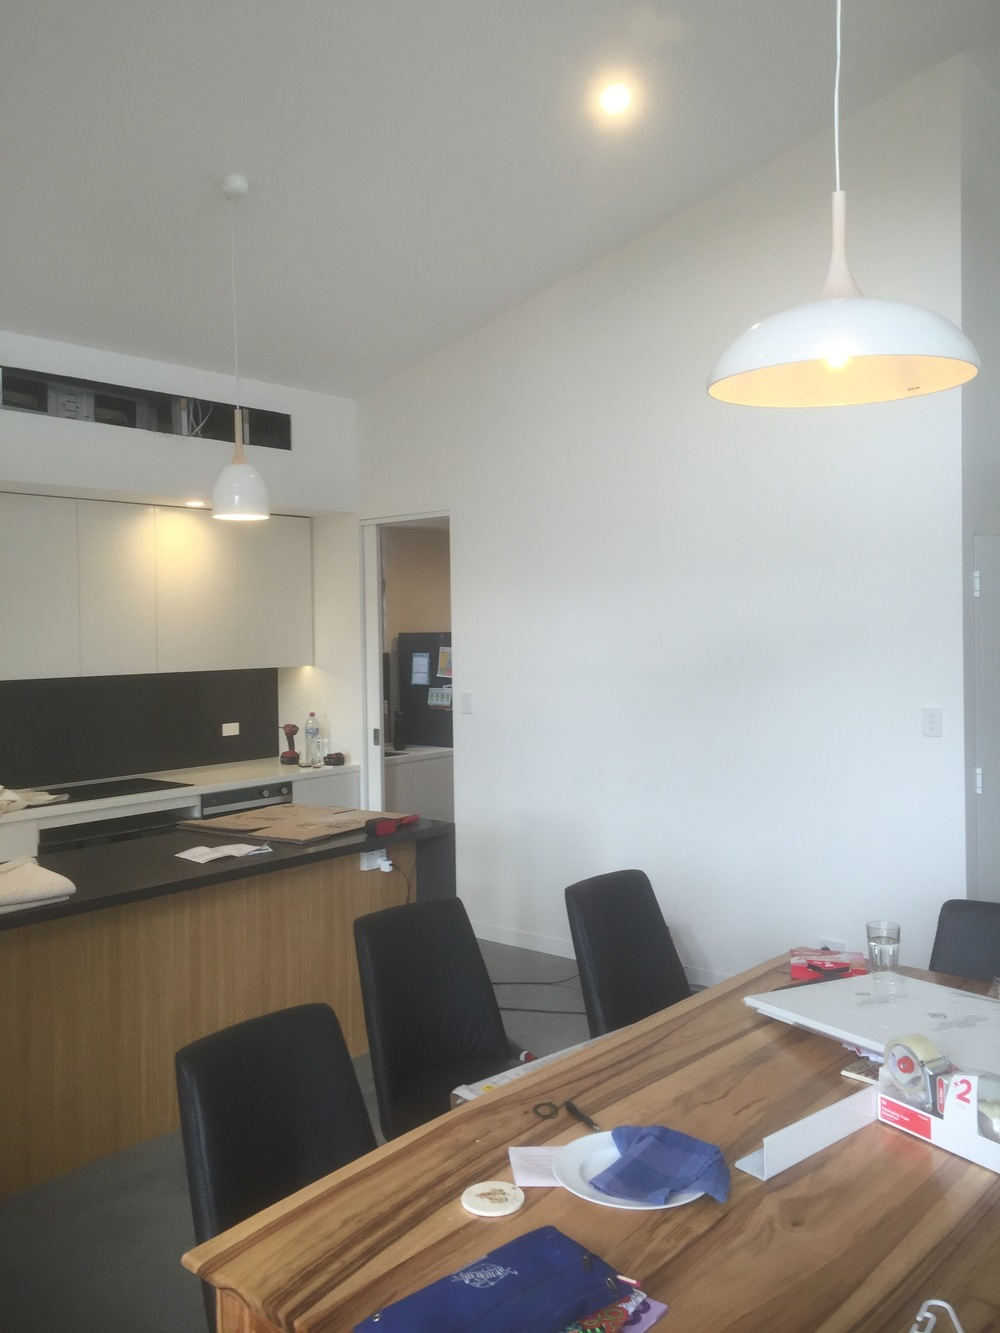 Household lighting installations, maintenance, upgrades and repairs